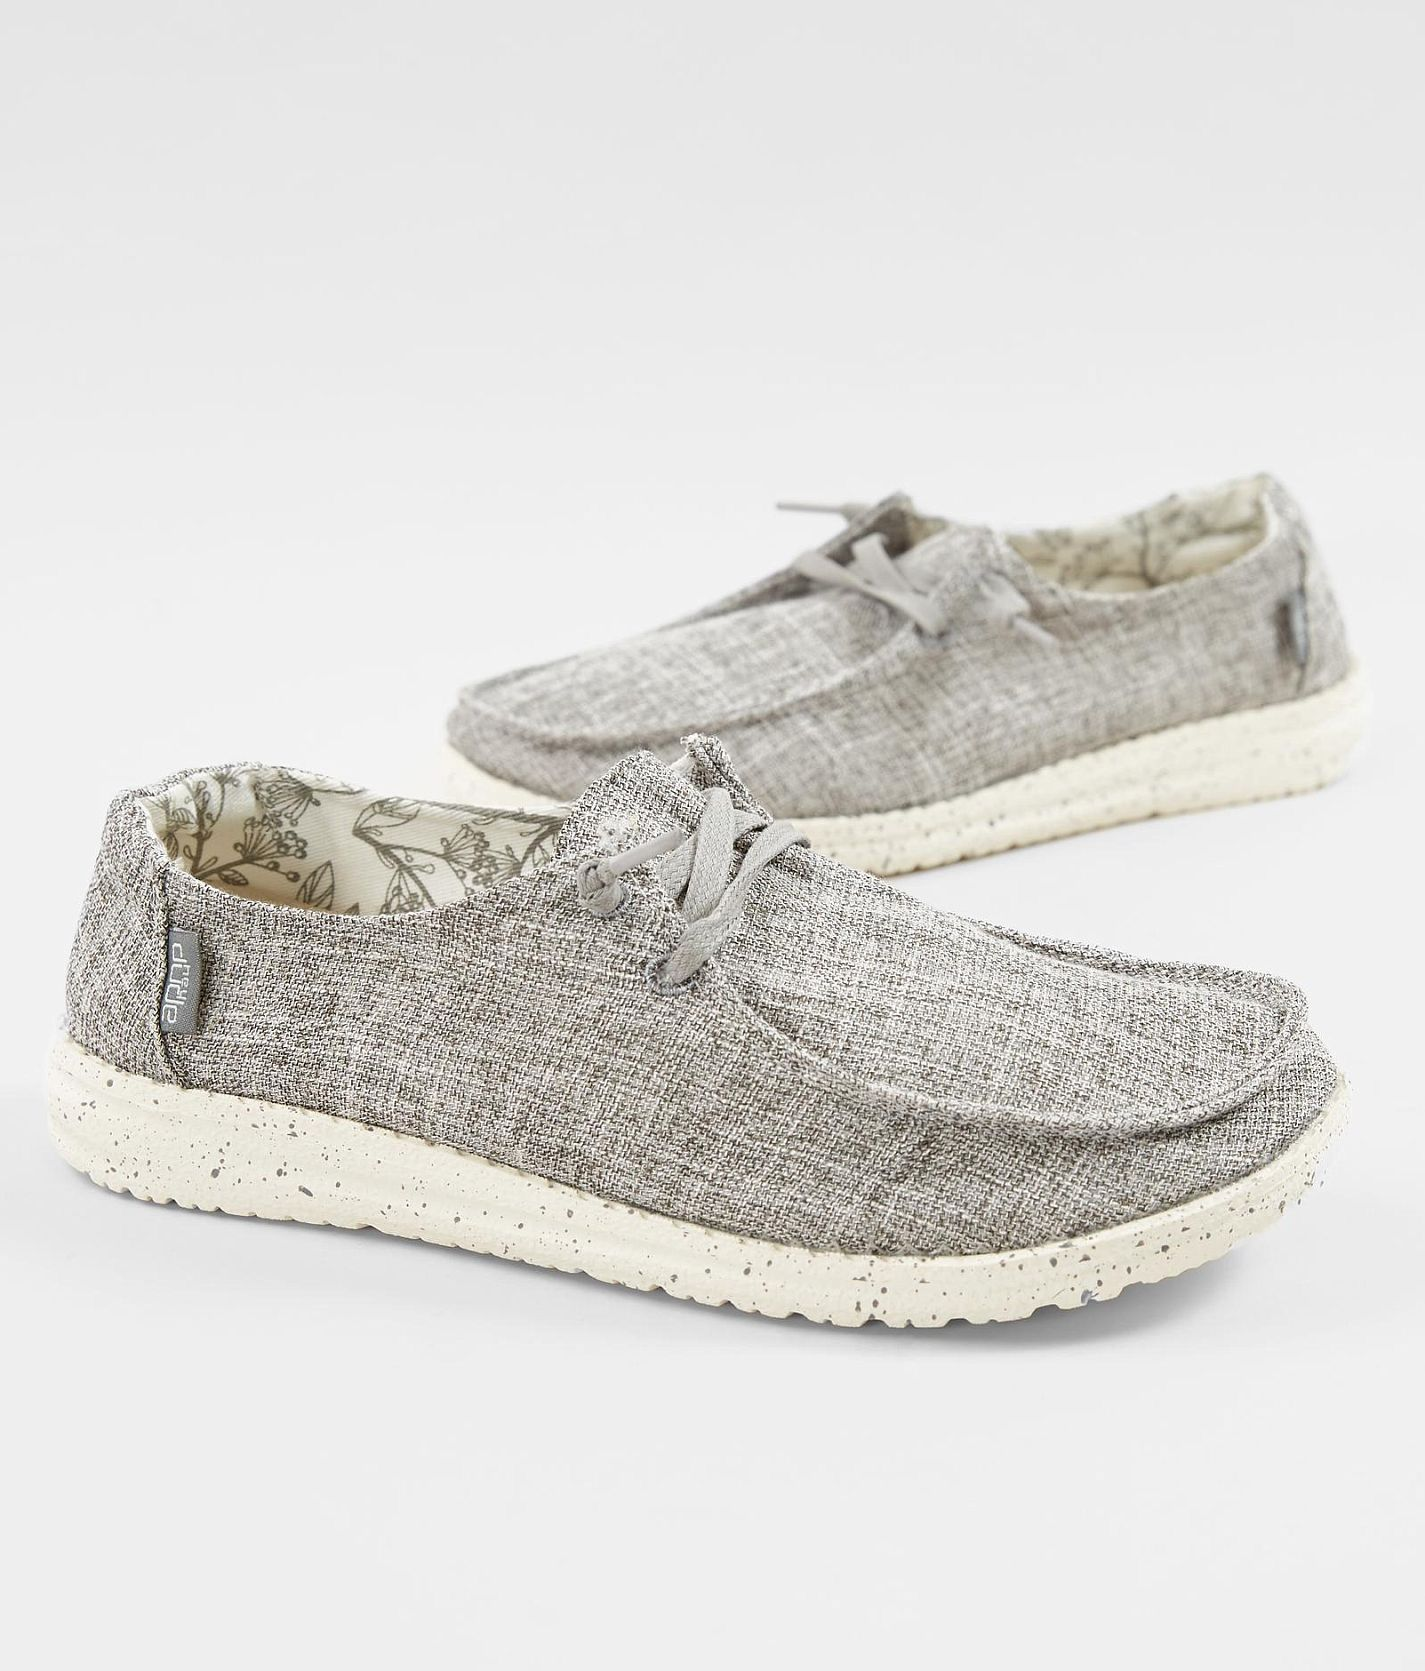 2458158c9d7918 Hey Dude Wendy Shoe - Women s Shoes in Iron